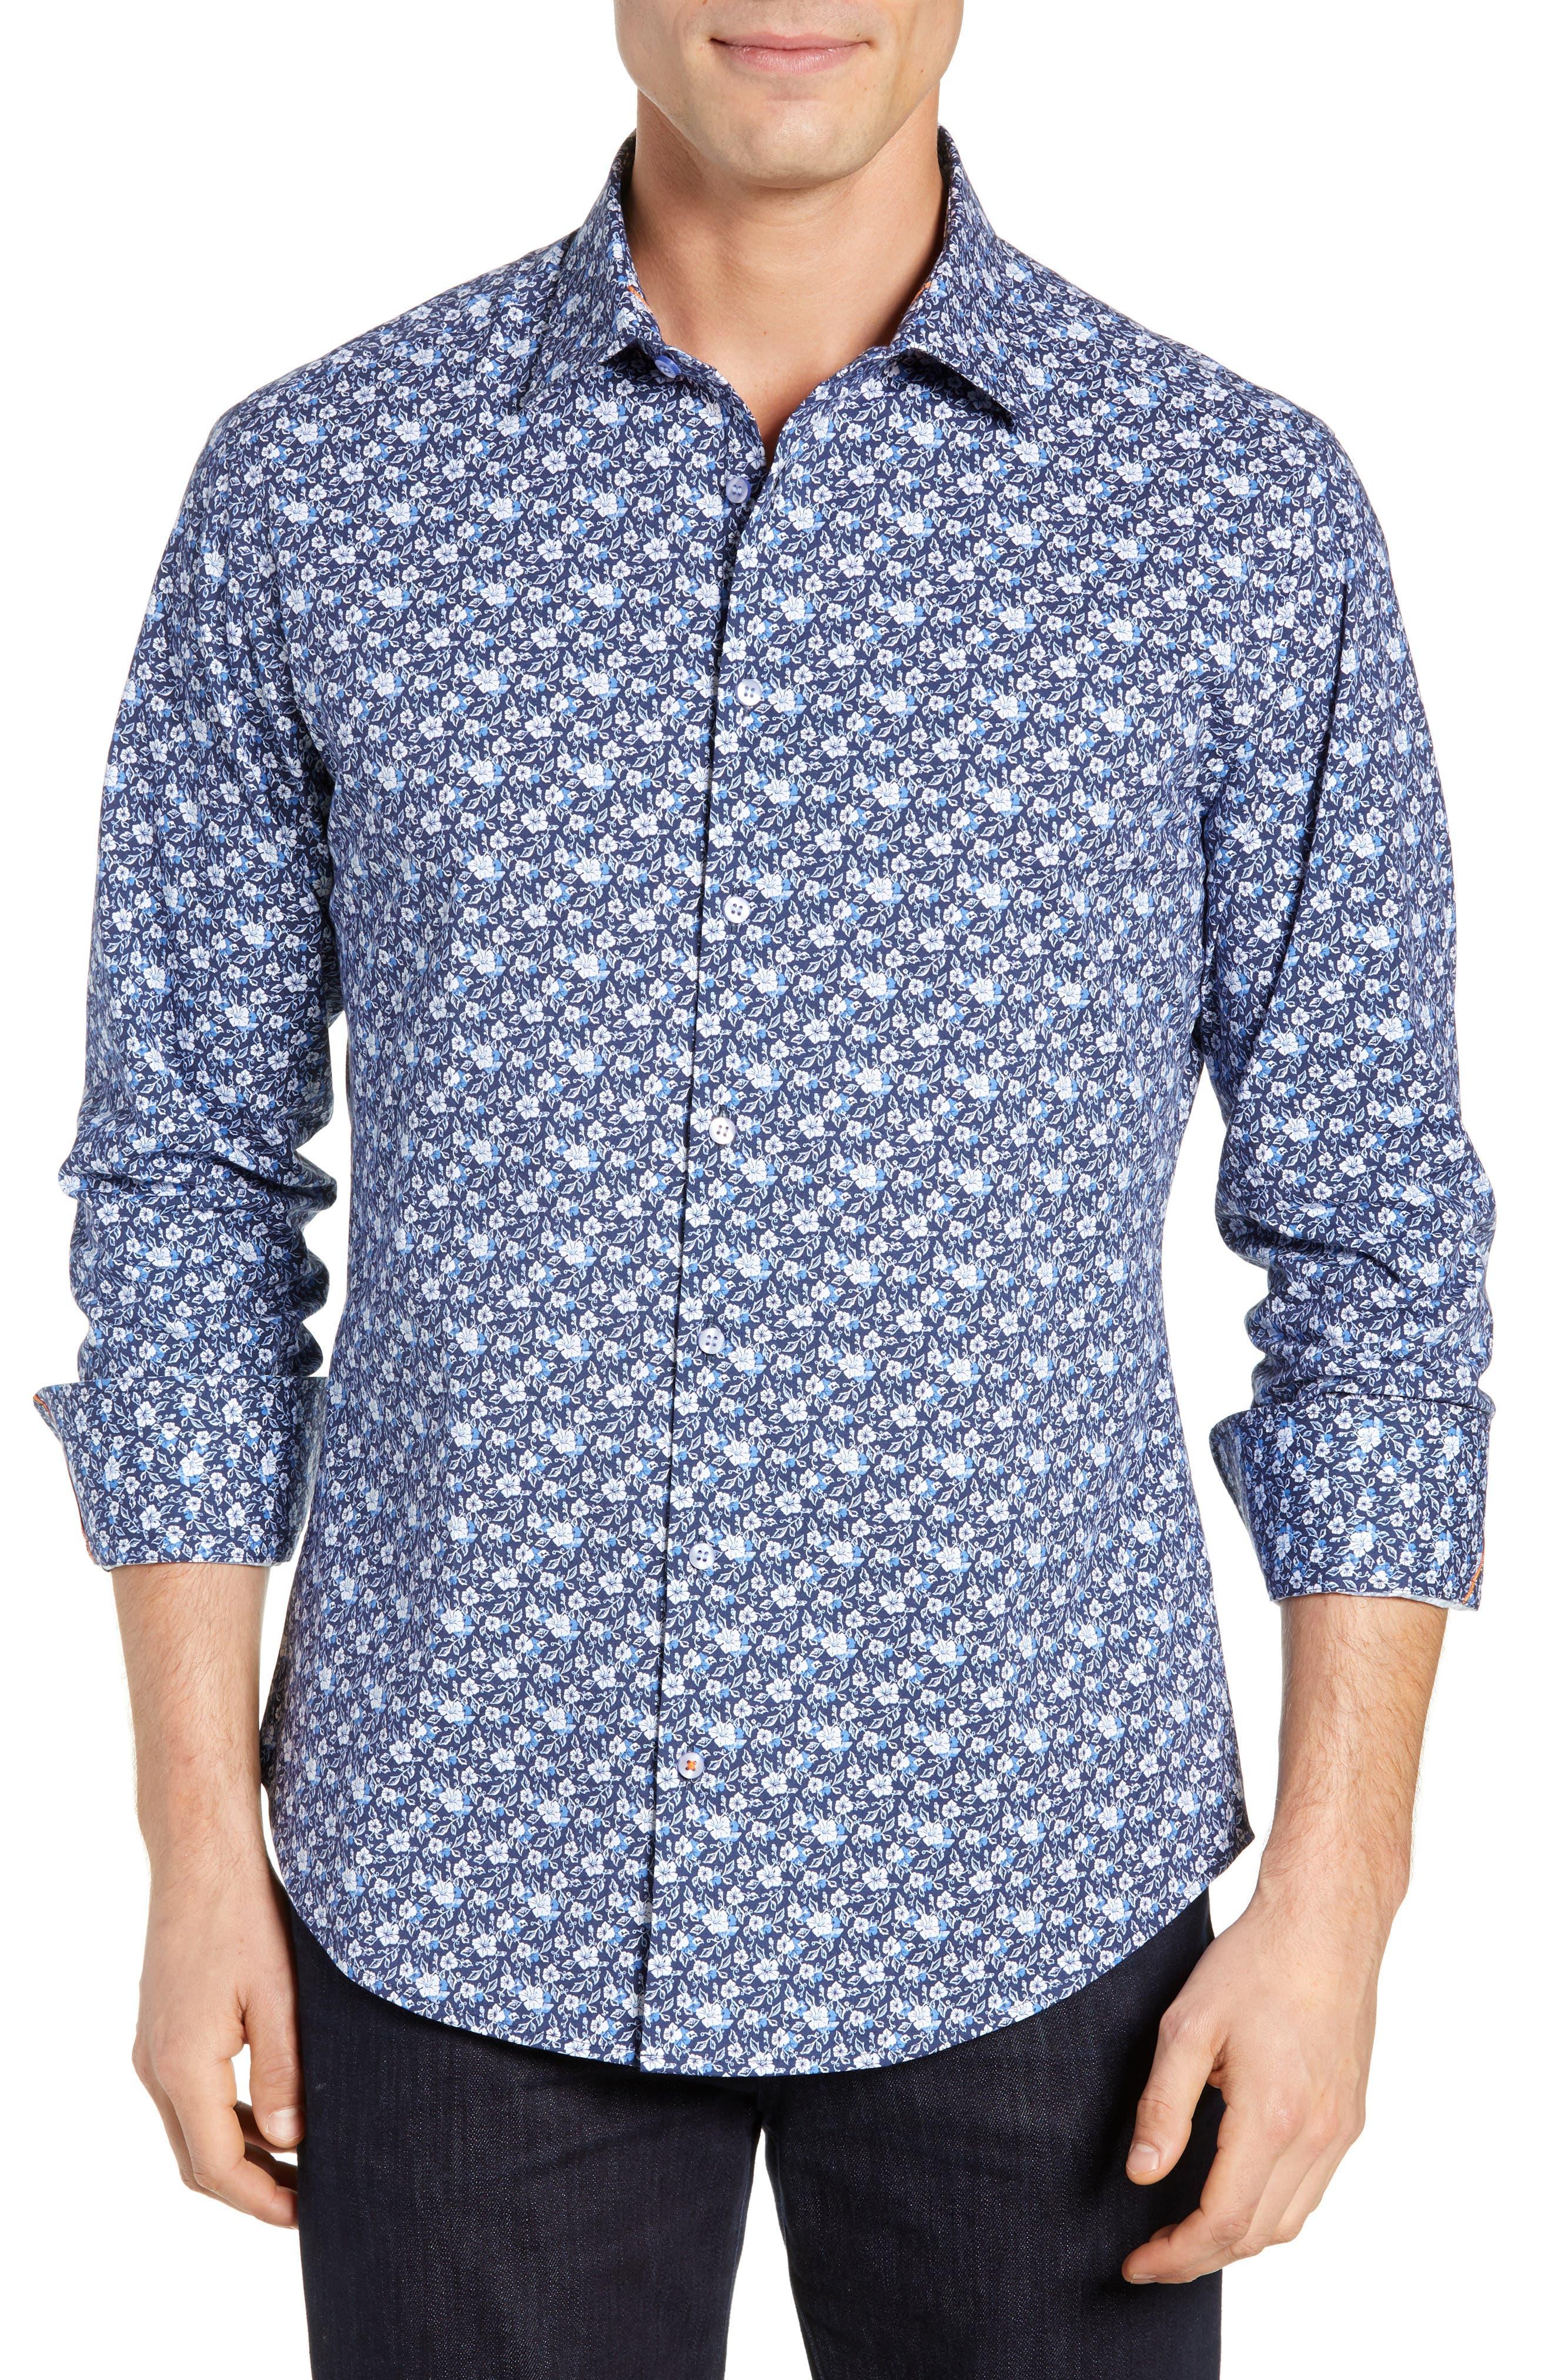 Regular Fit Floral Print Knit Sport Shirt, Main, color, NAVY